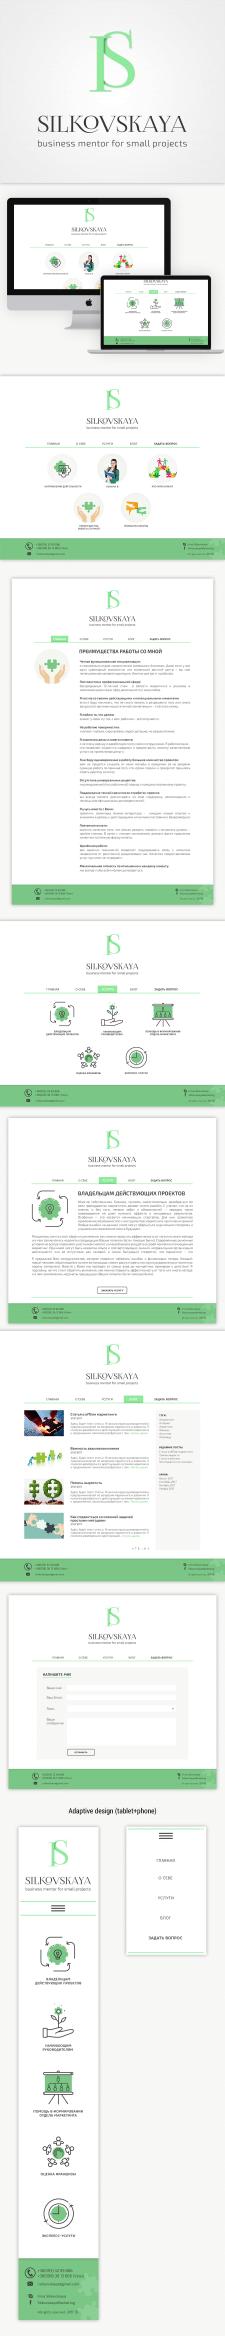 Сайт маркетолога Ирины Сильковской